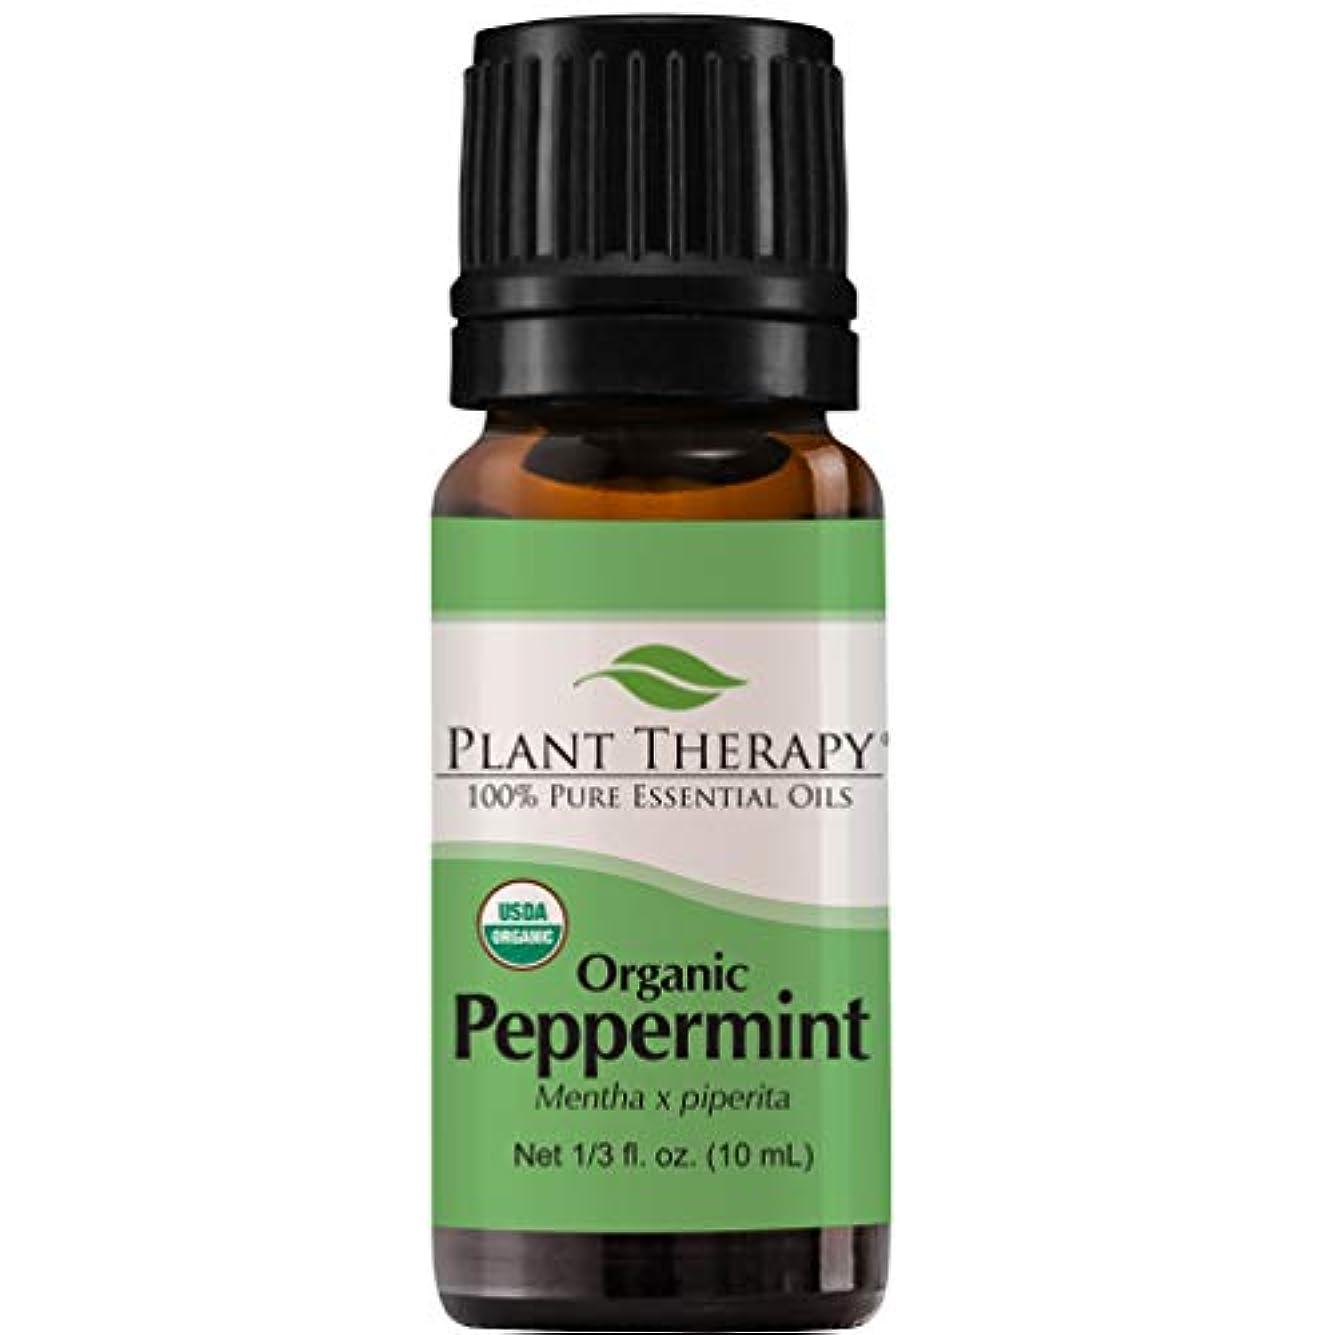 Plant Therapy Essential Oils (プラントセラピー エッセンシャルオイル) オーガニック ペパーミント エッセンシャルオイル